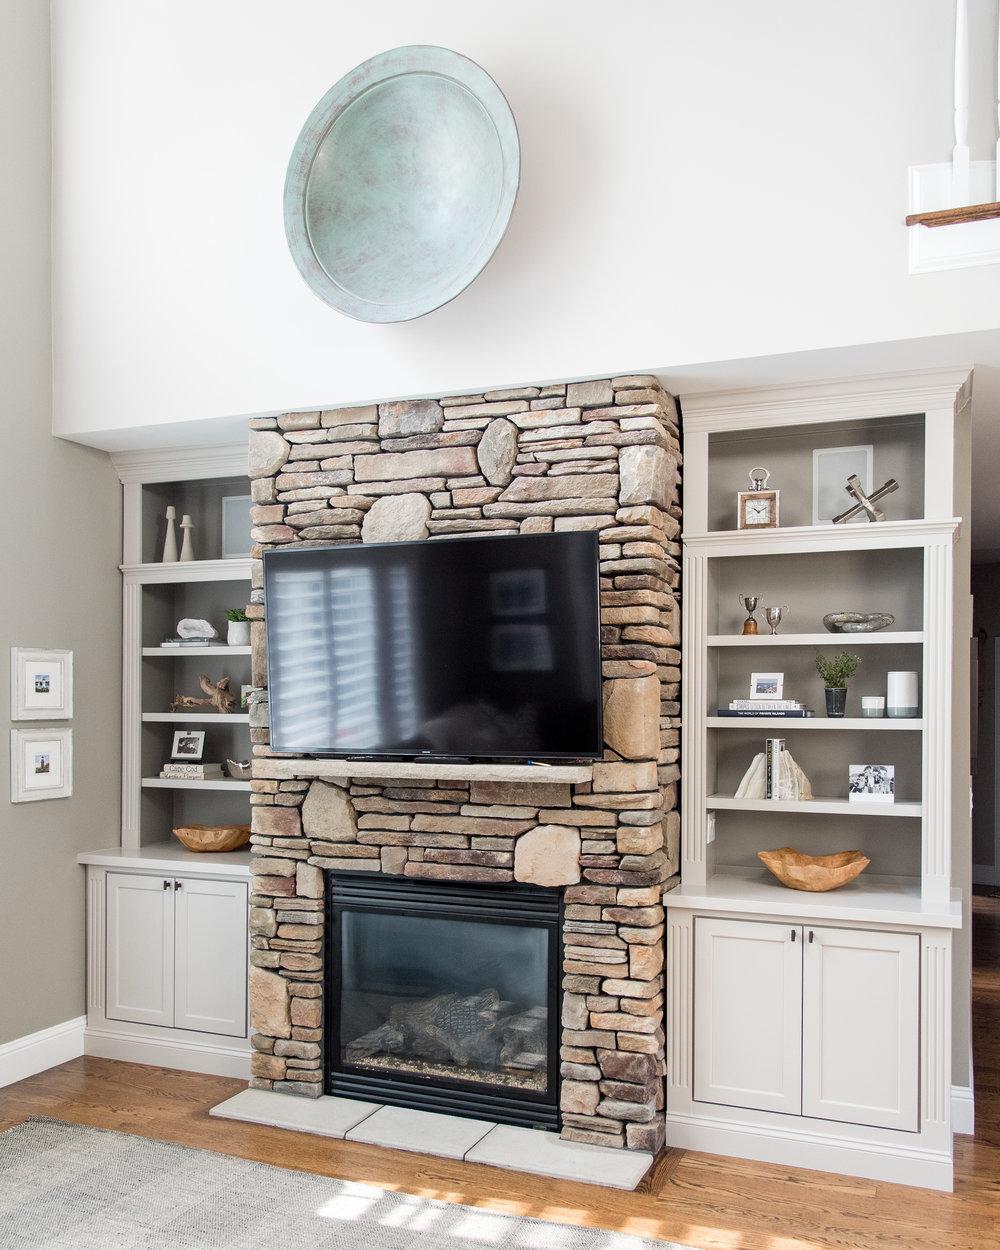 little meadow  gina baran interiors and design Boston luxury designer family  room design built-ins